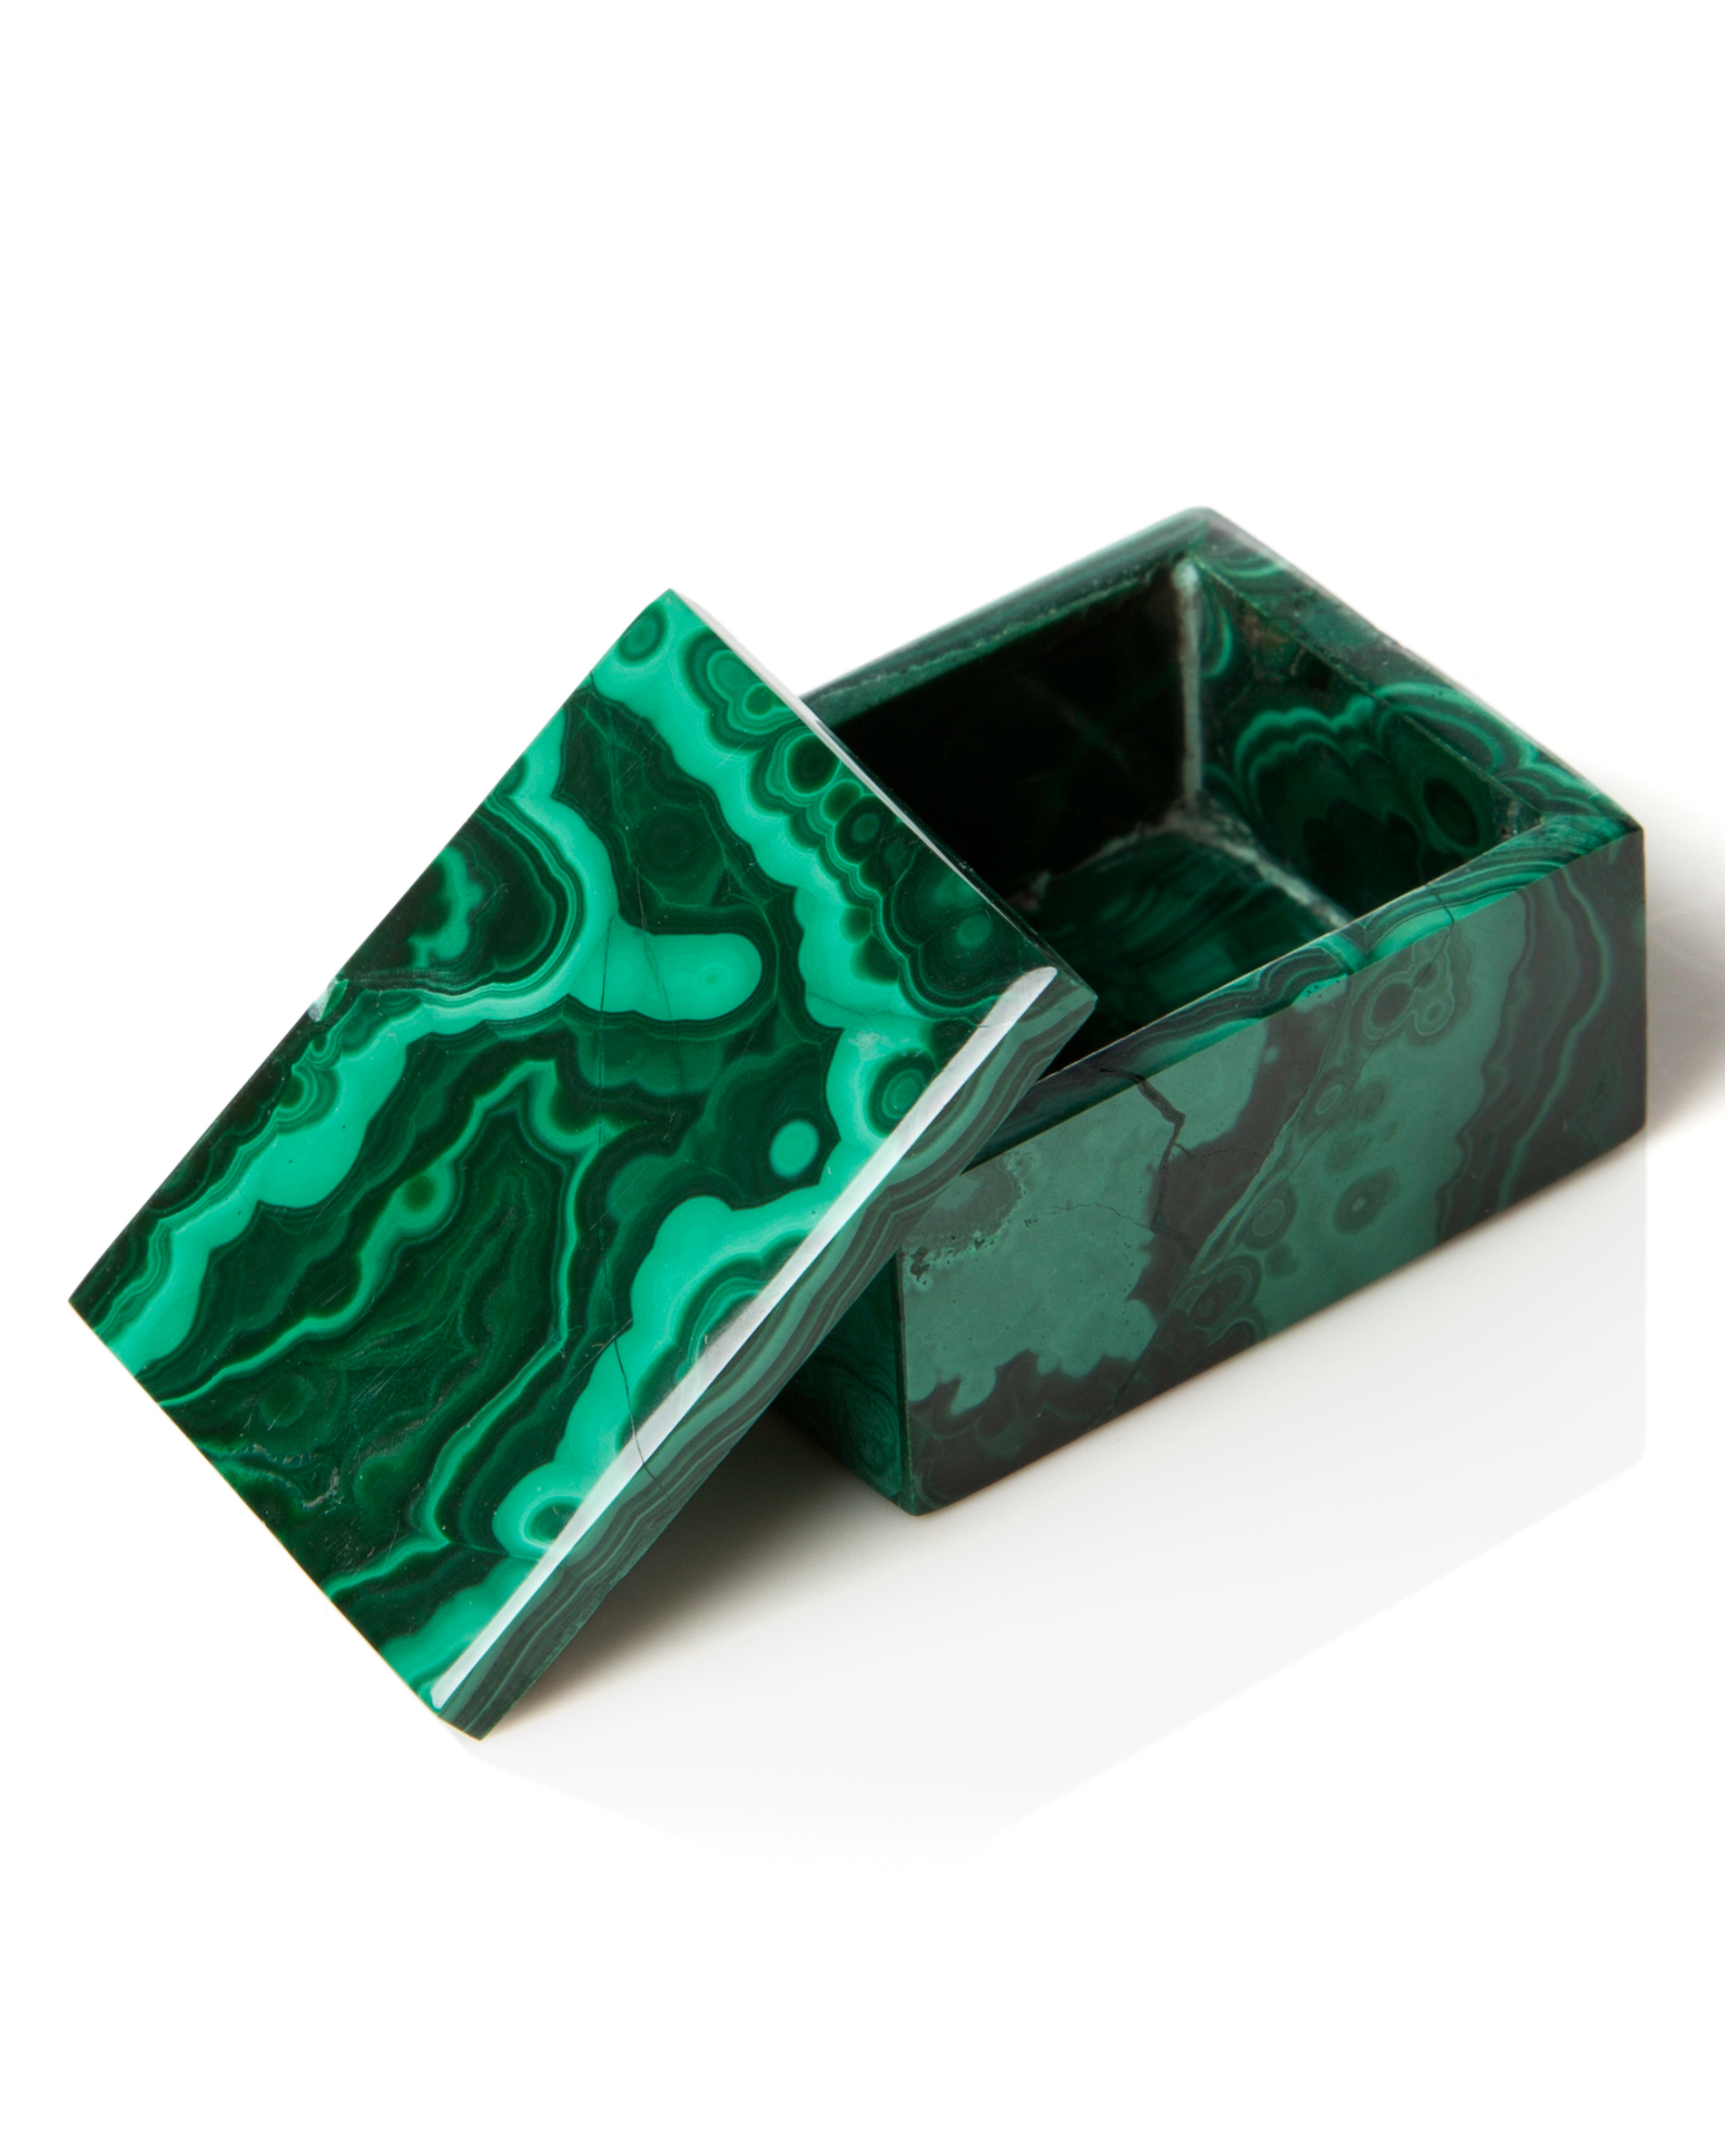 ring-boxes-the-evolution-store-small-malachite-box-0115.jpg